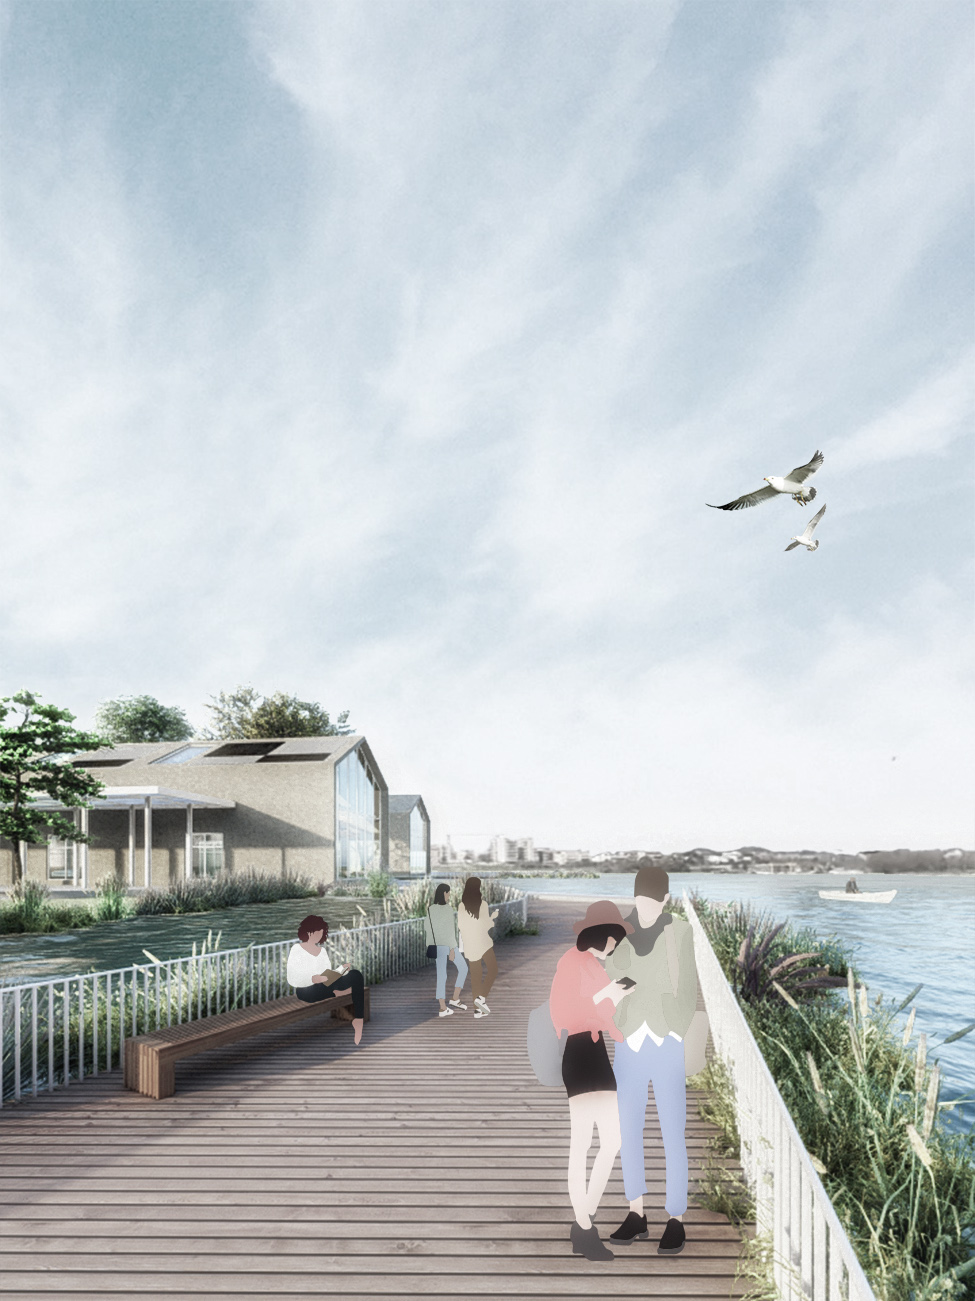 taranto oasi urbana waterfront